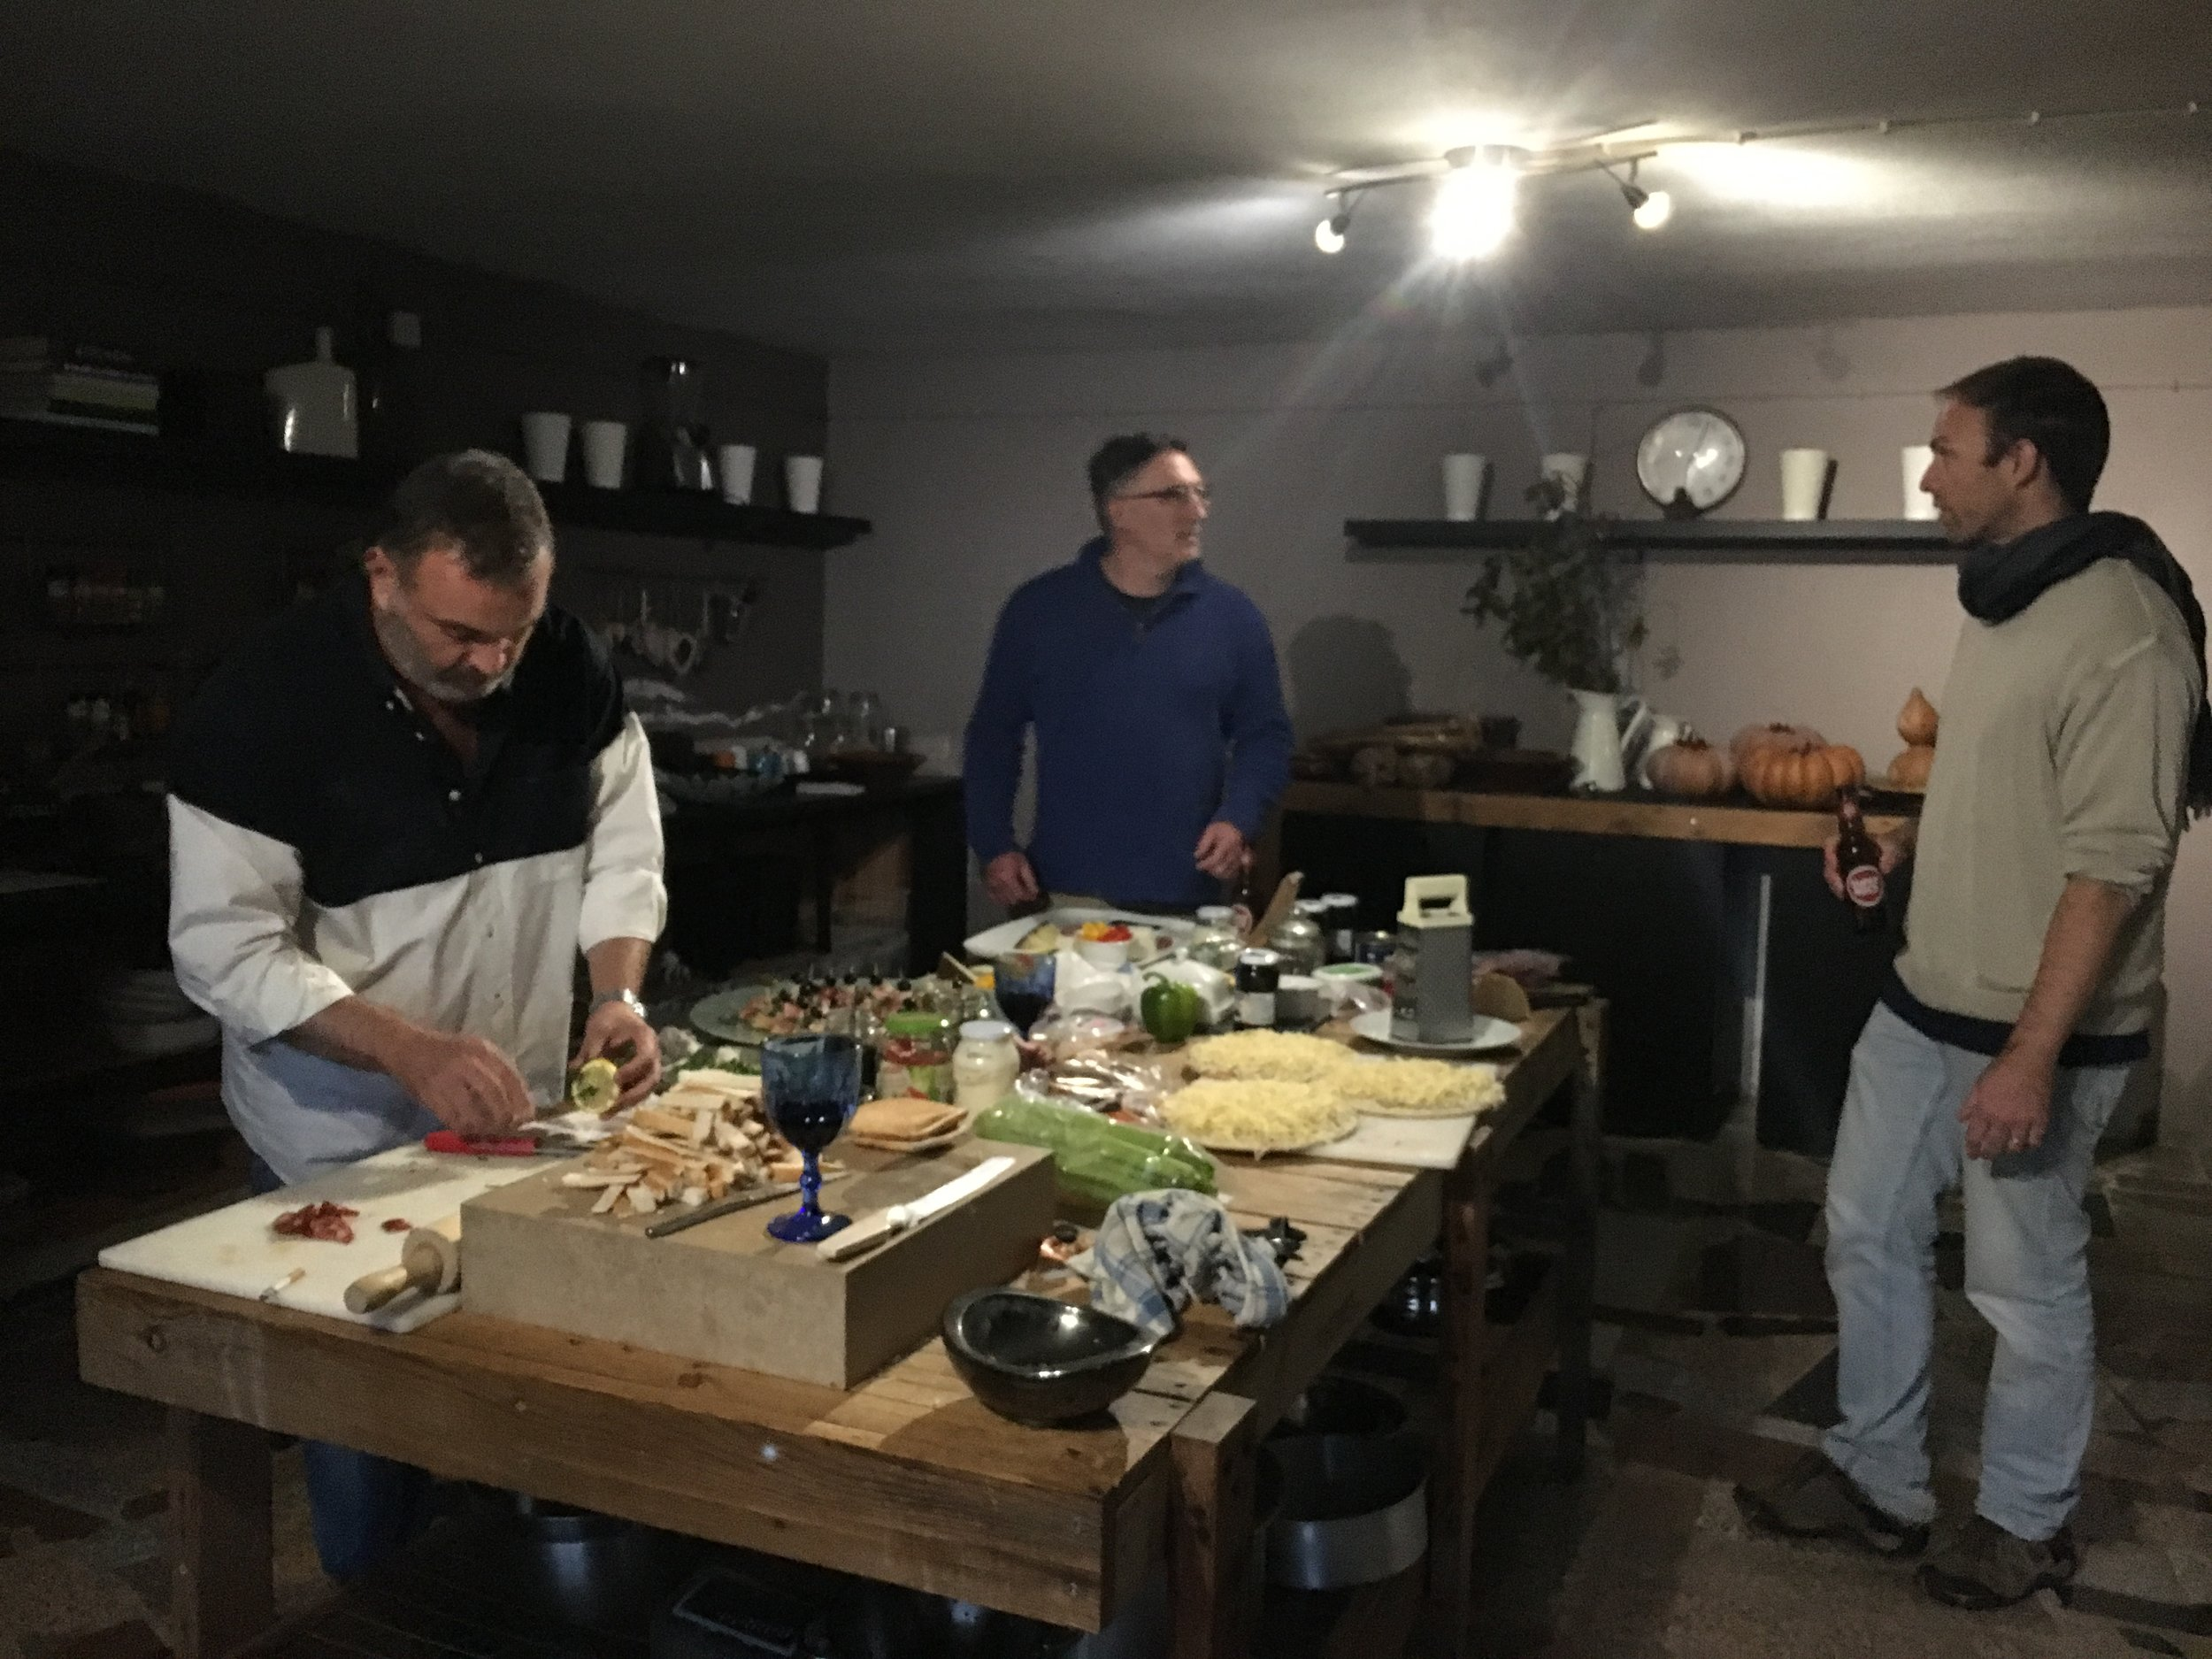 Art-cafe-art-studio-workshop-kitchen.jpg